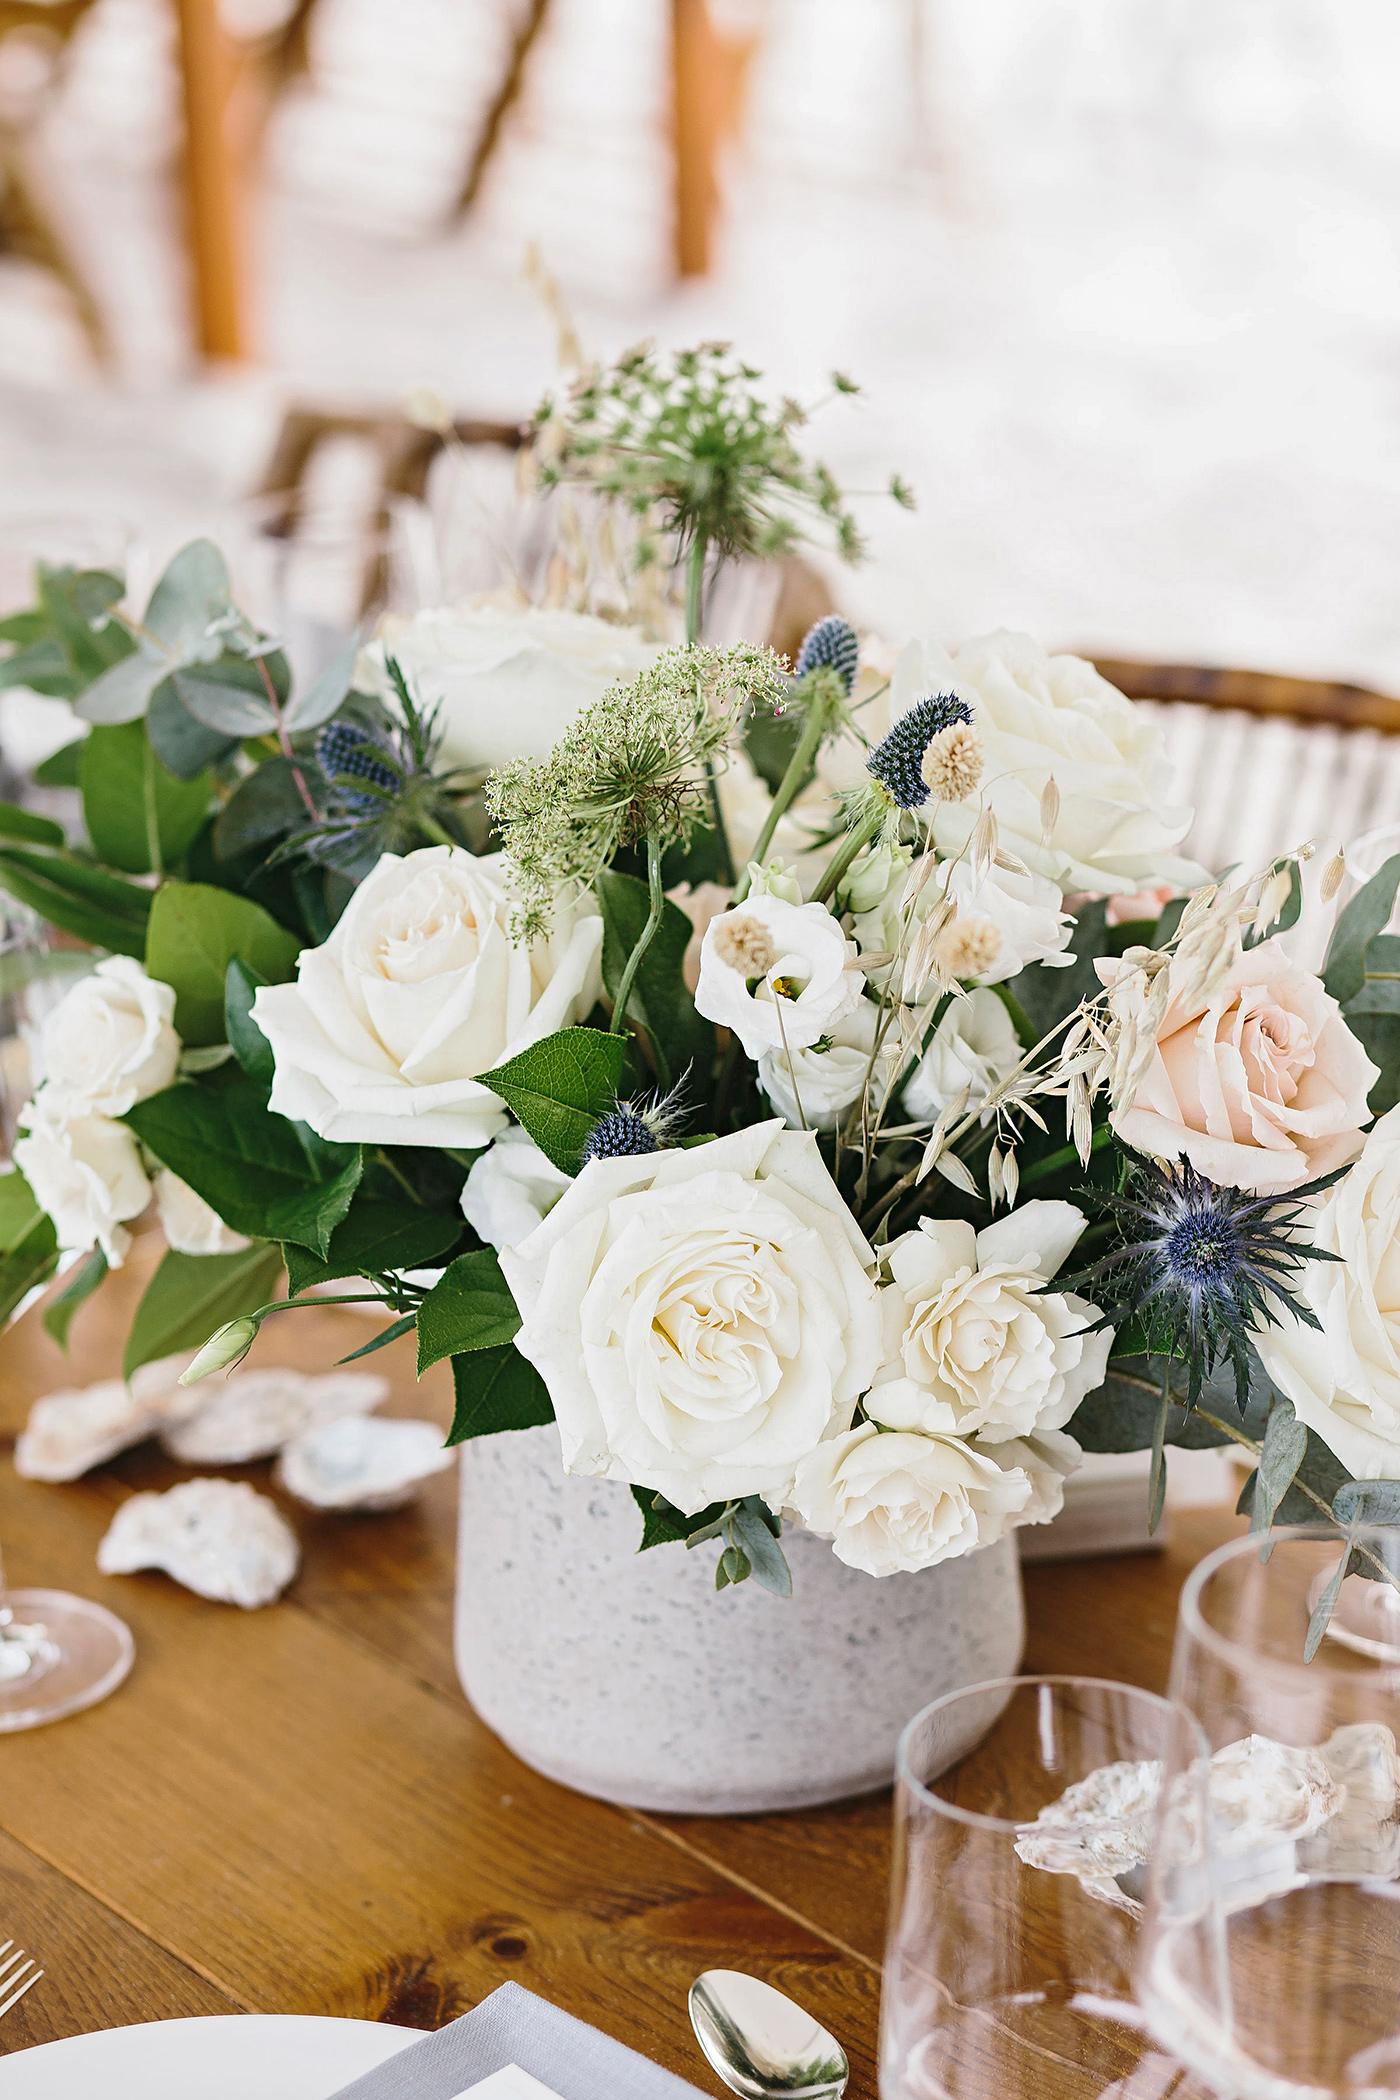 white rose wedding centerpiece on table